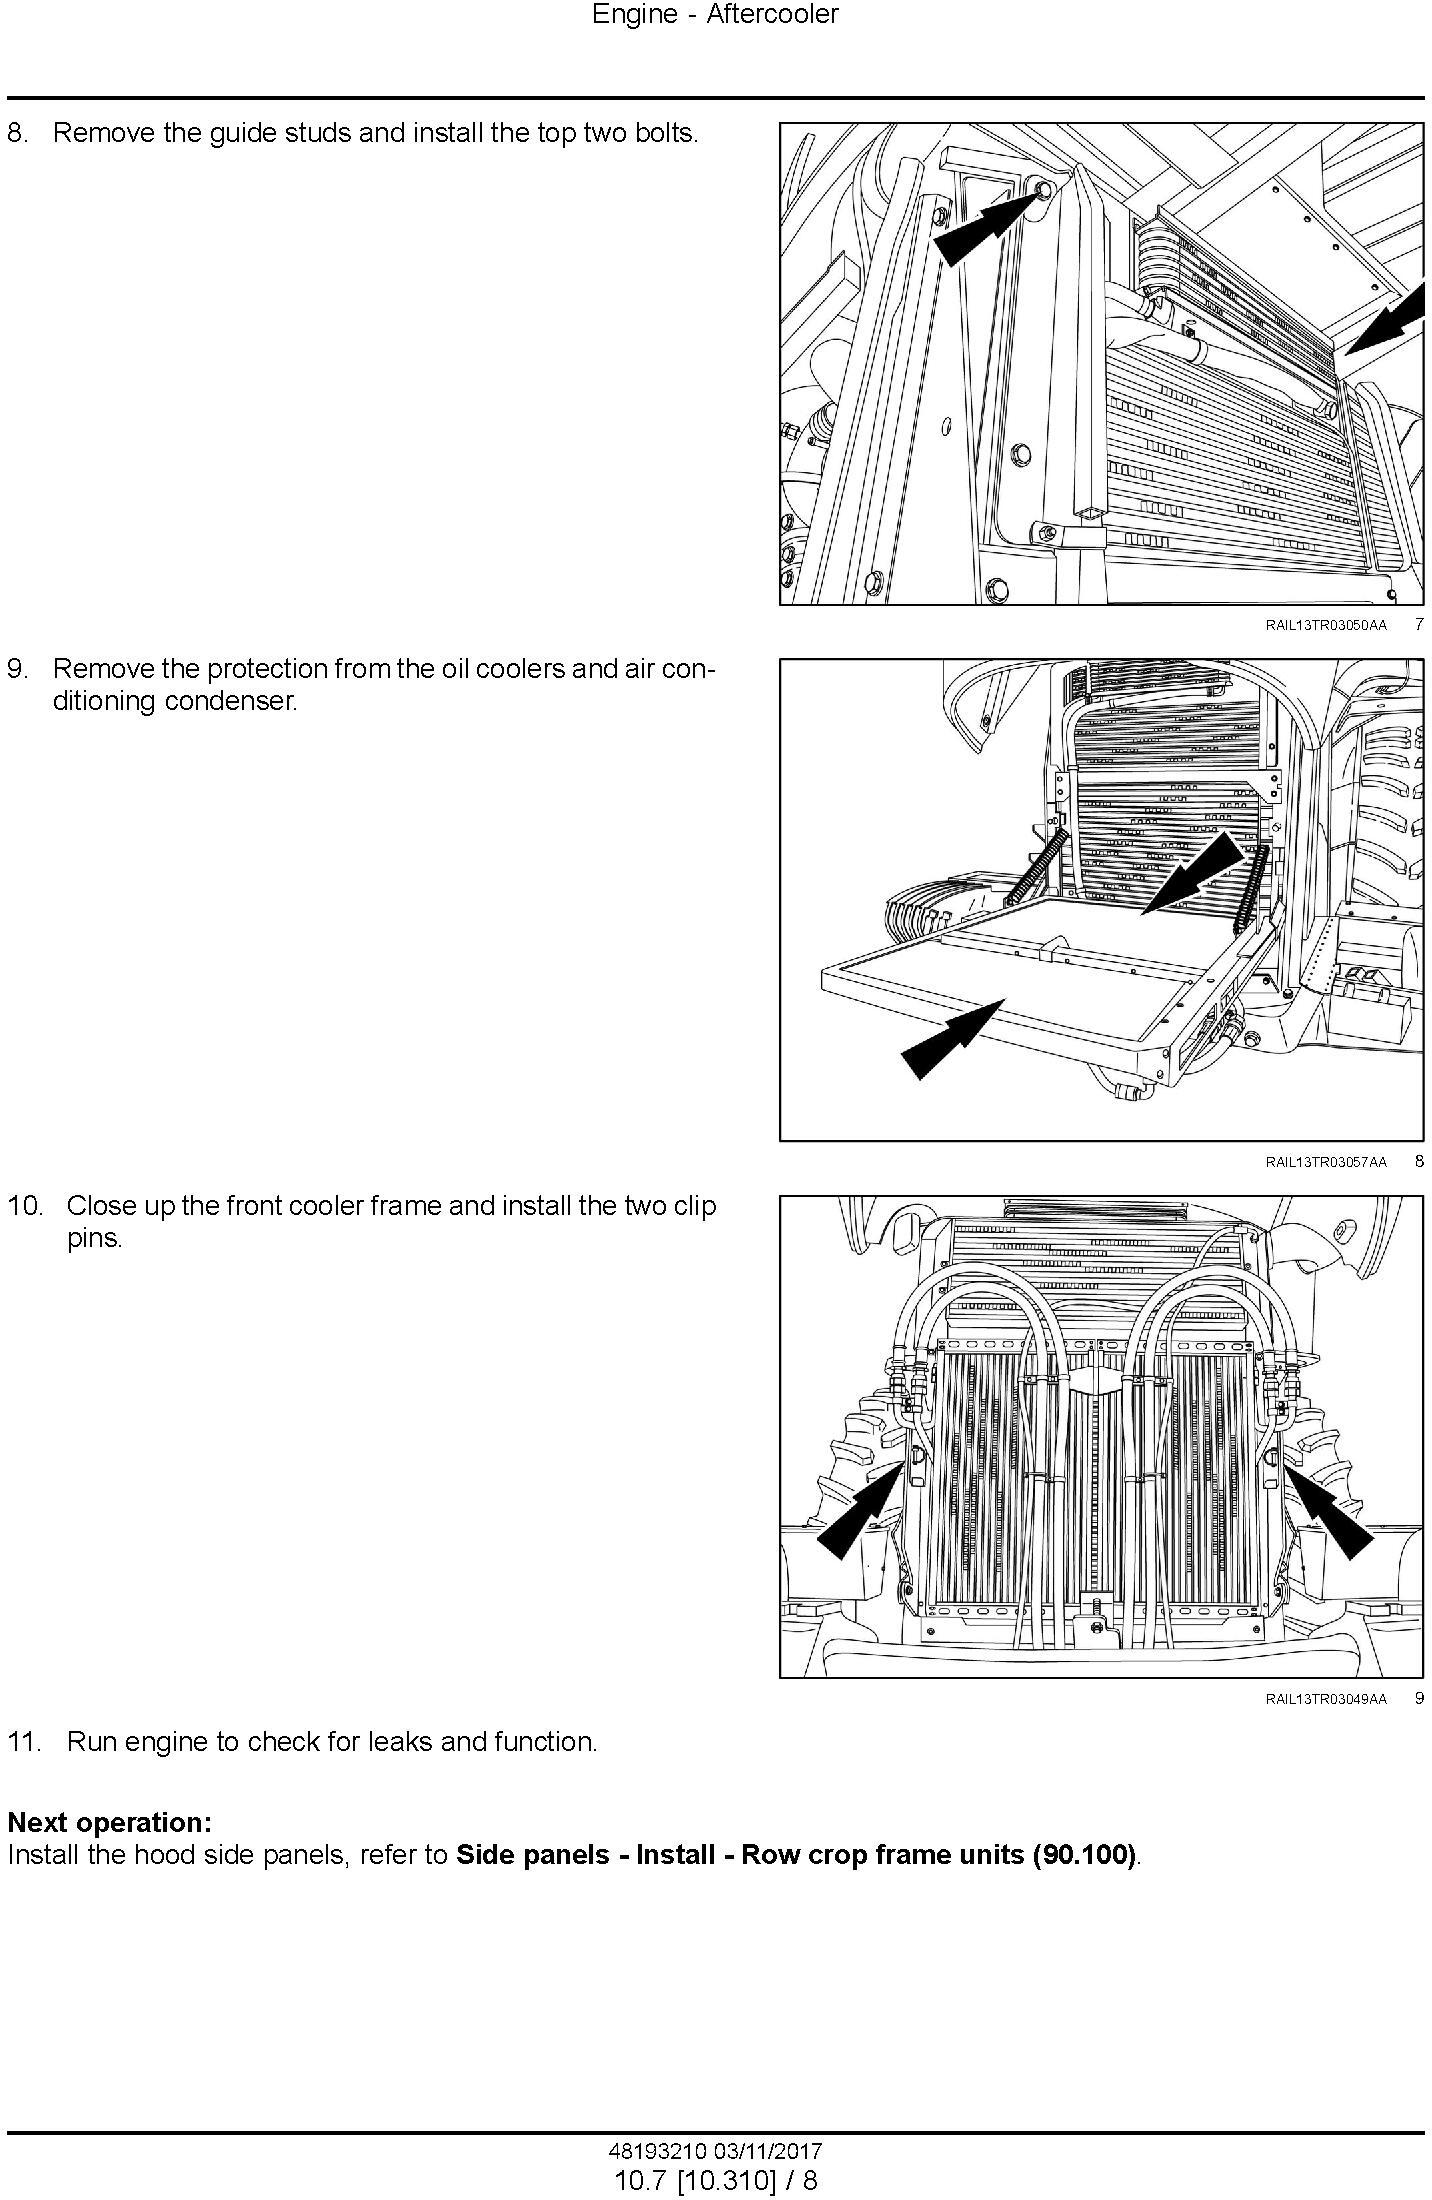 New Holland T9.435, T9.480, T9.530, T9.565, T9.600, T9.645, T9.700 Tier4B Tractor Service Manual(EU) - 1